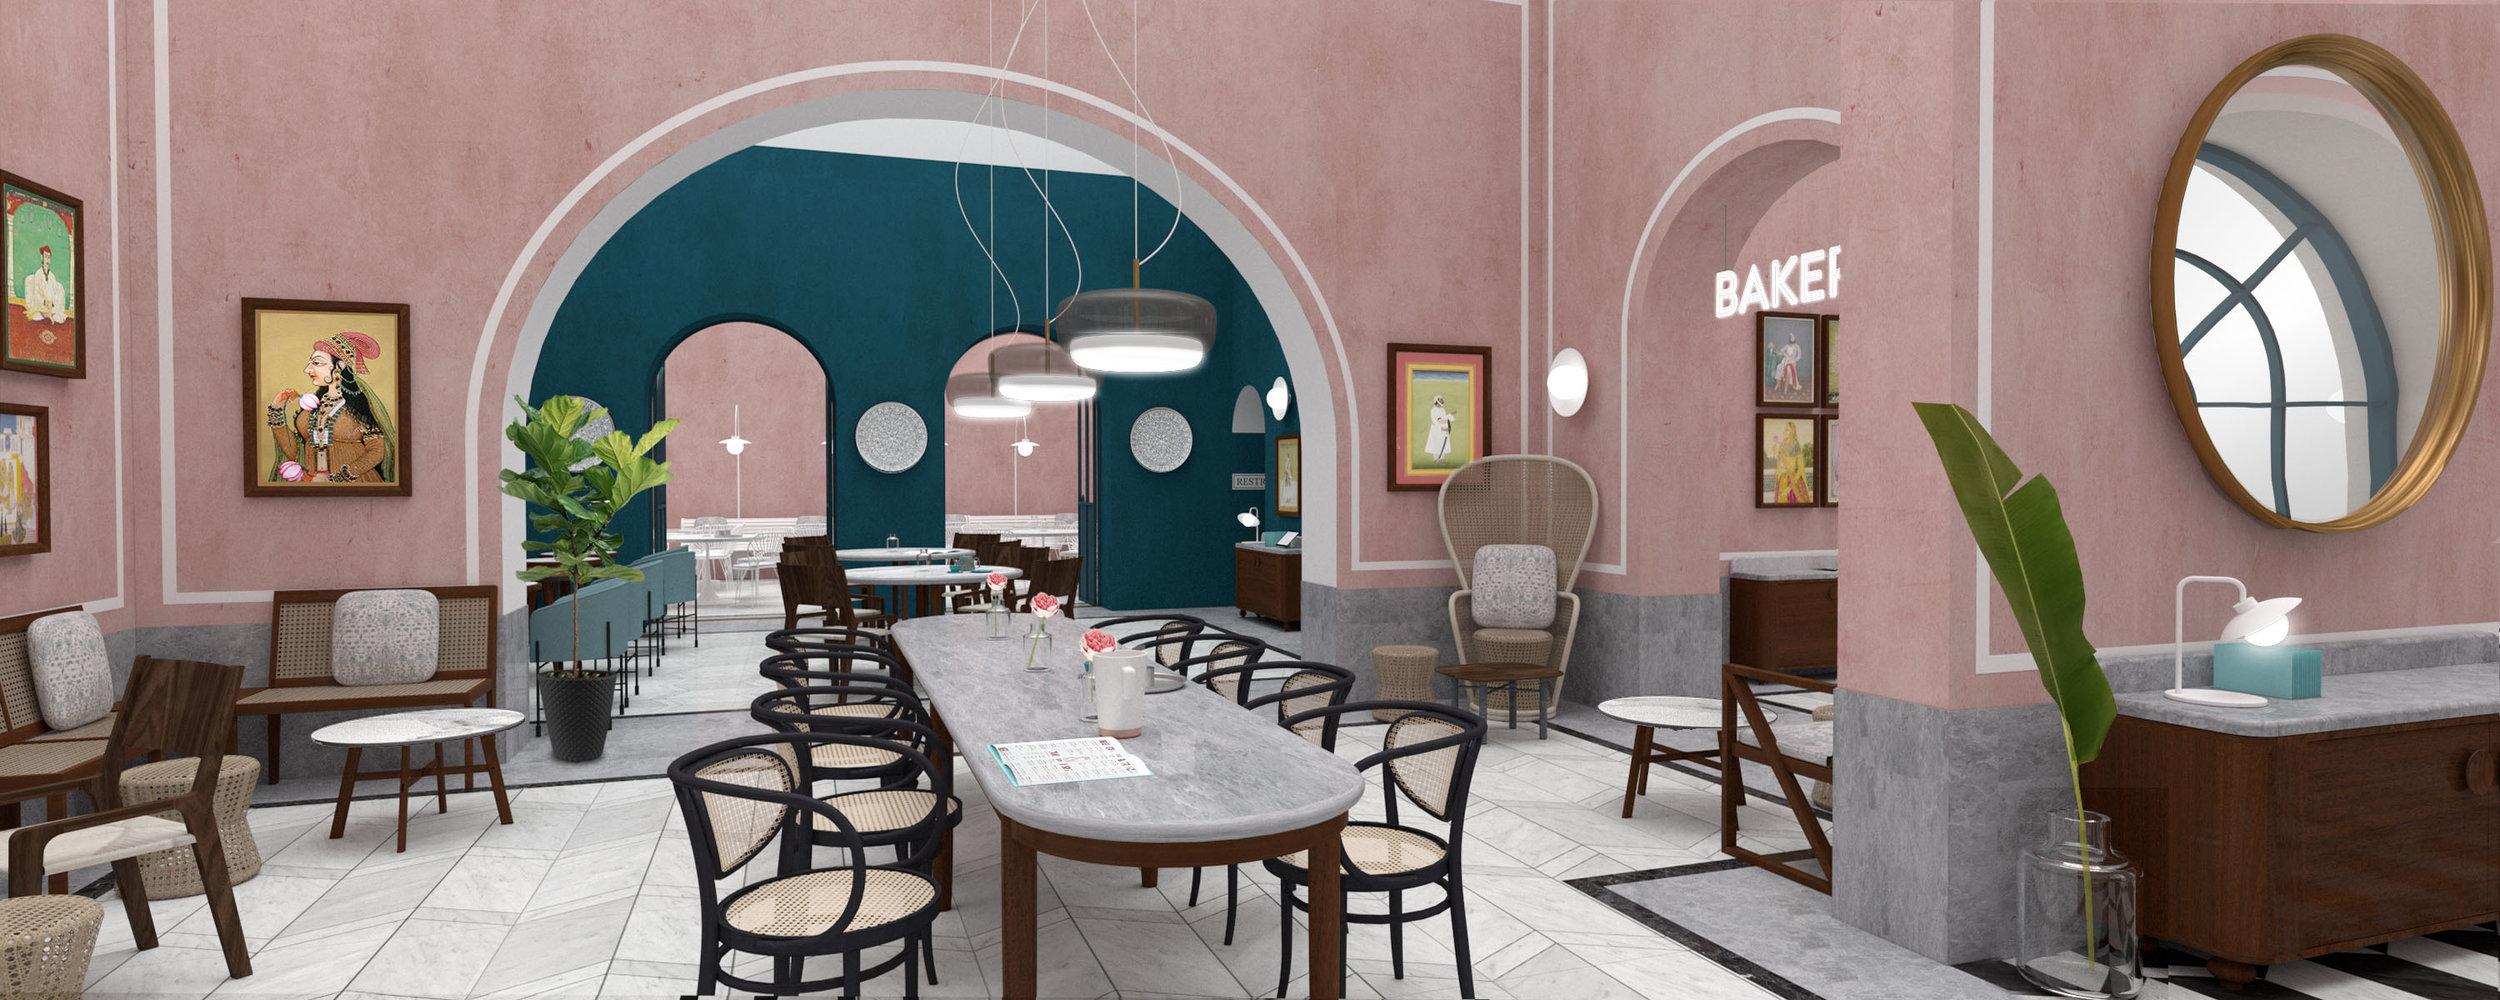 lunarlunar_interior_design_cafe_bakery_restaurant_pistachio_rose_seating_1.jpg